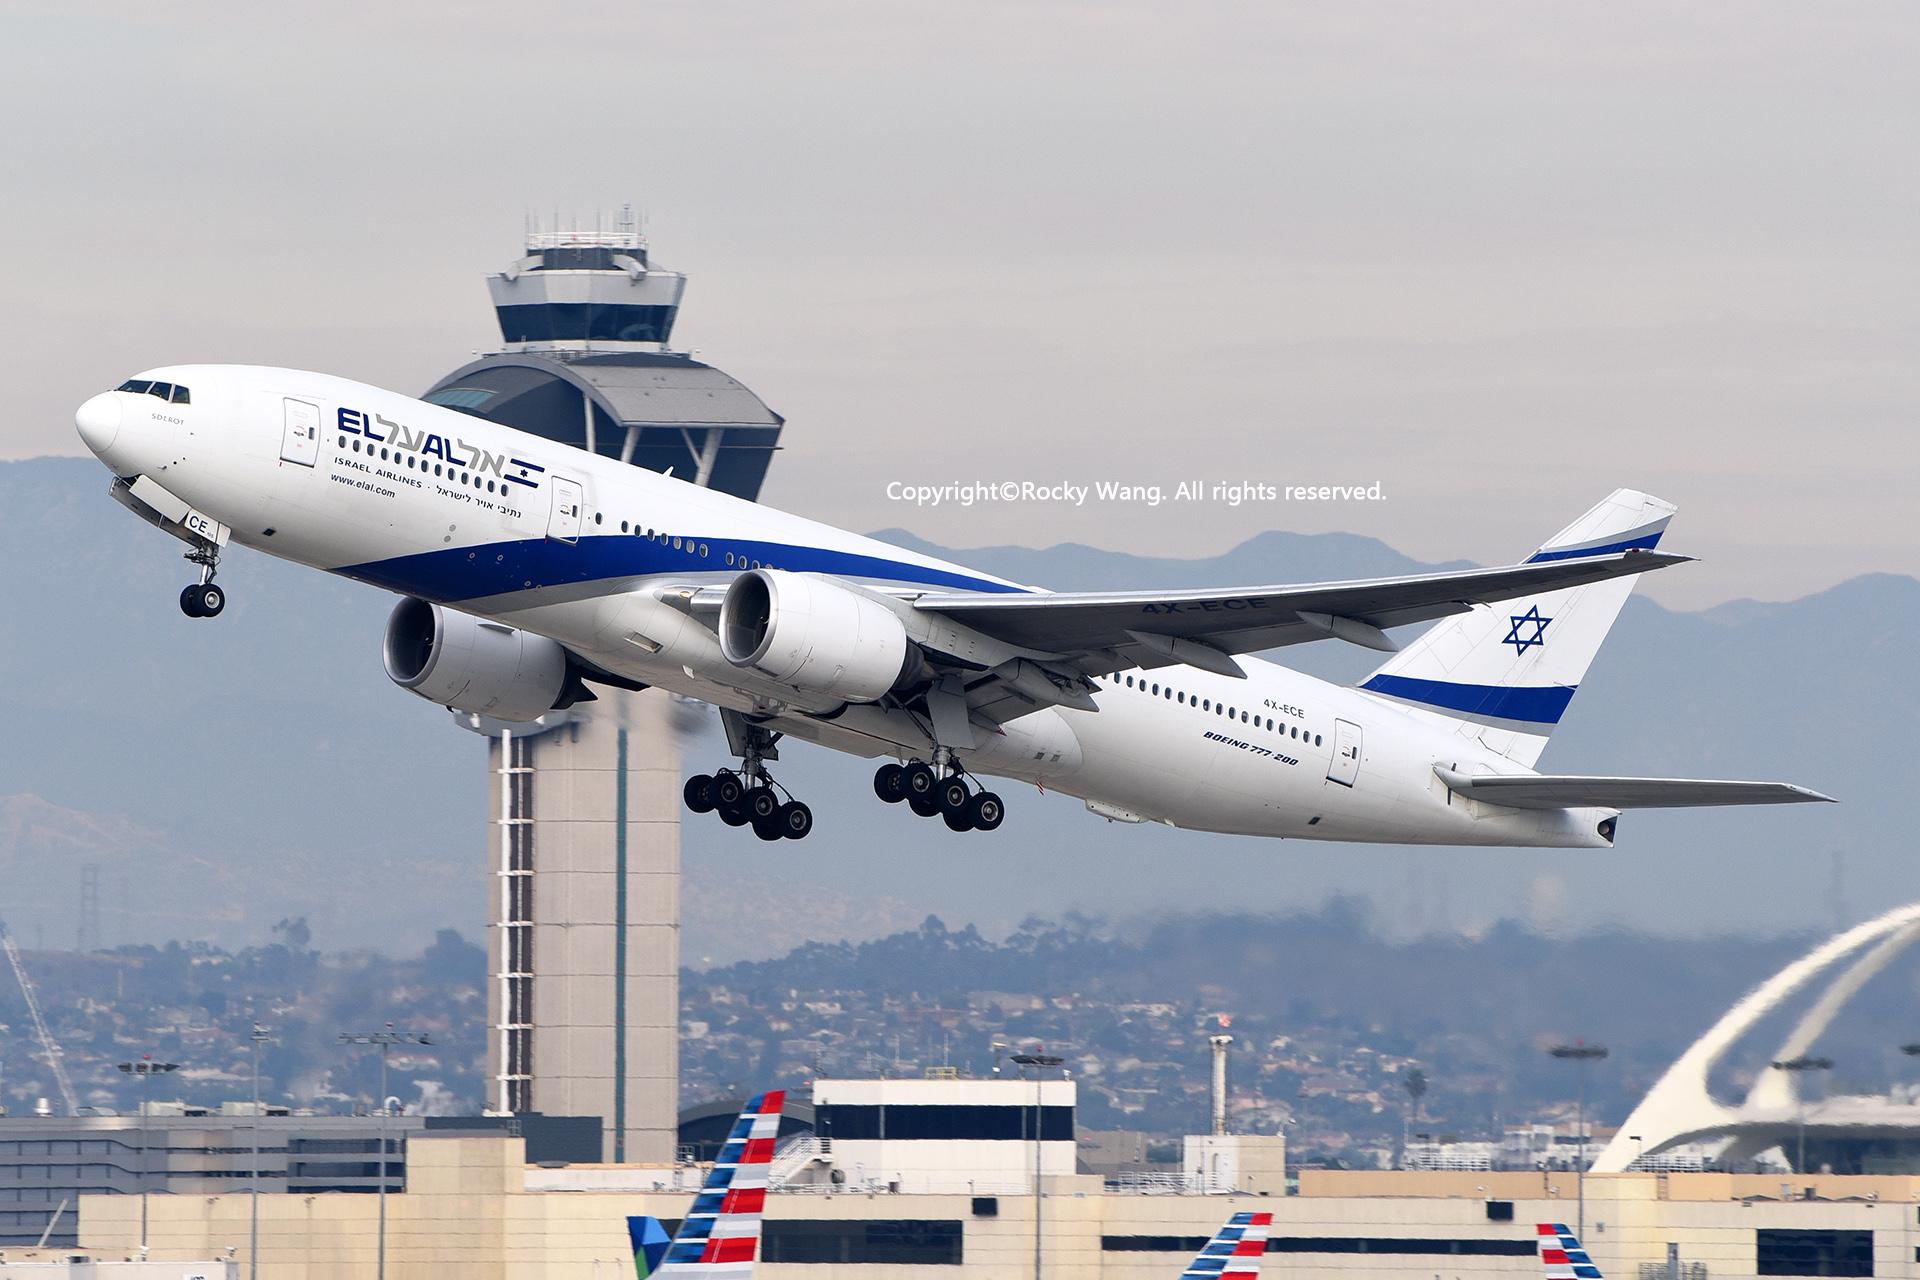 Re:[原创]居家了 批量处理老图 倾情奉献52家777 BOEING 777-258(ER) 4X-ECE Los Angeles Int'l Airport